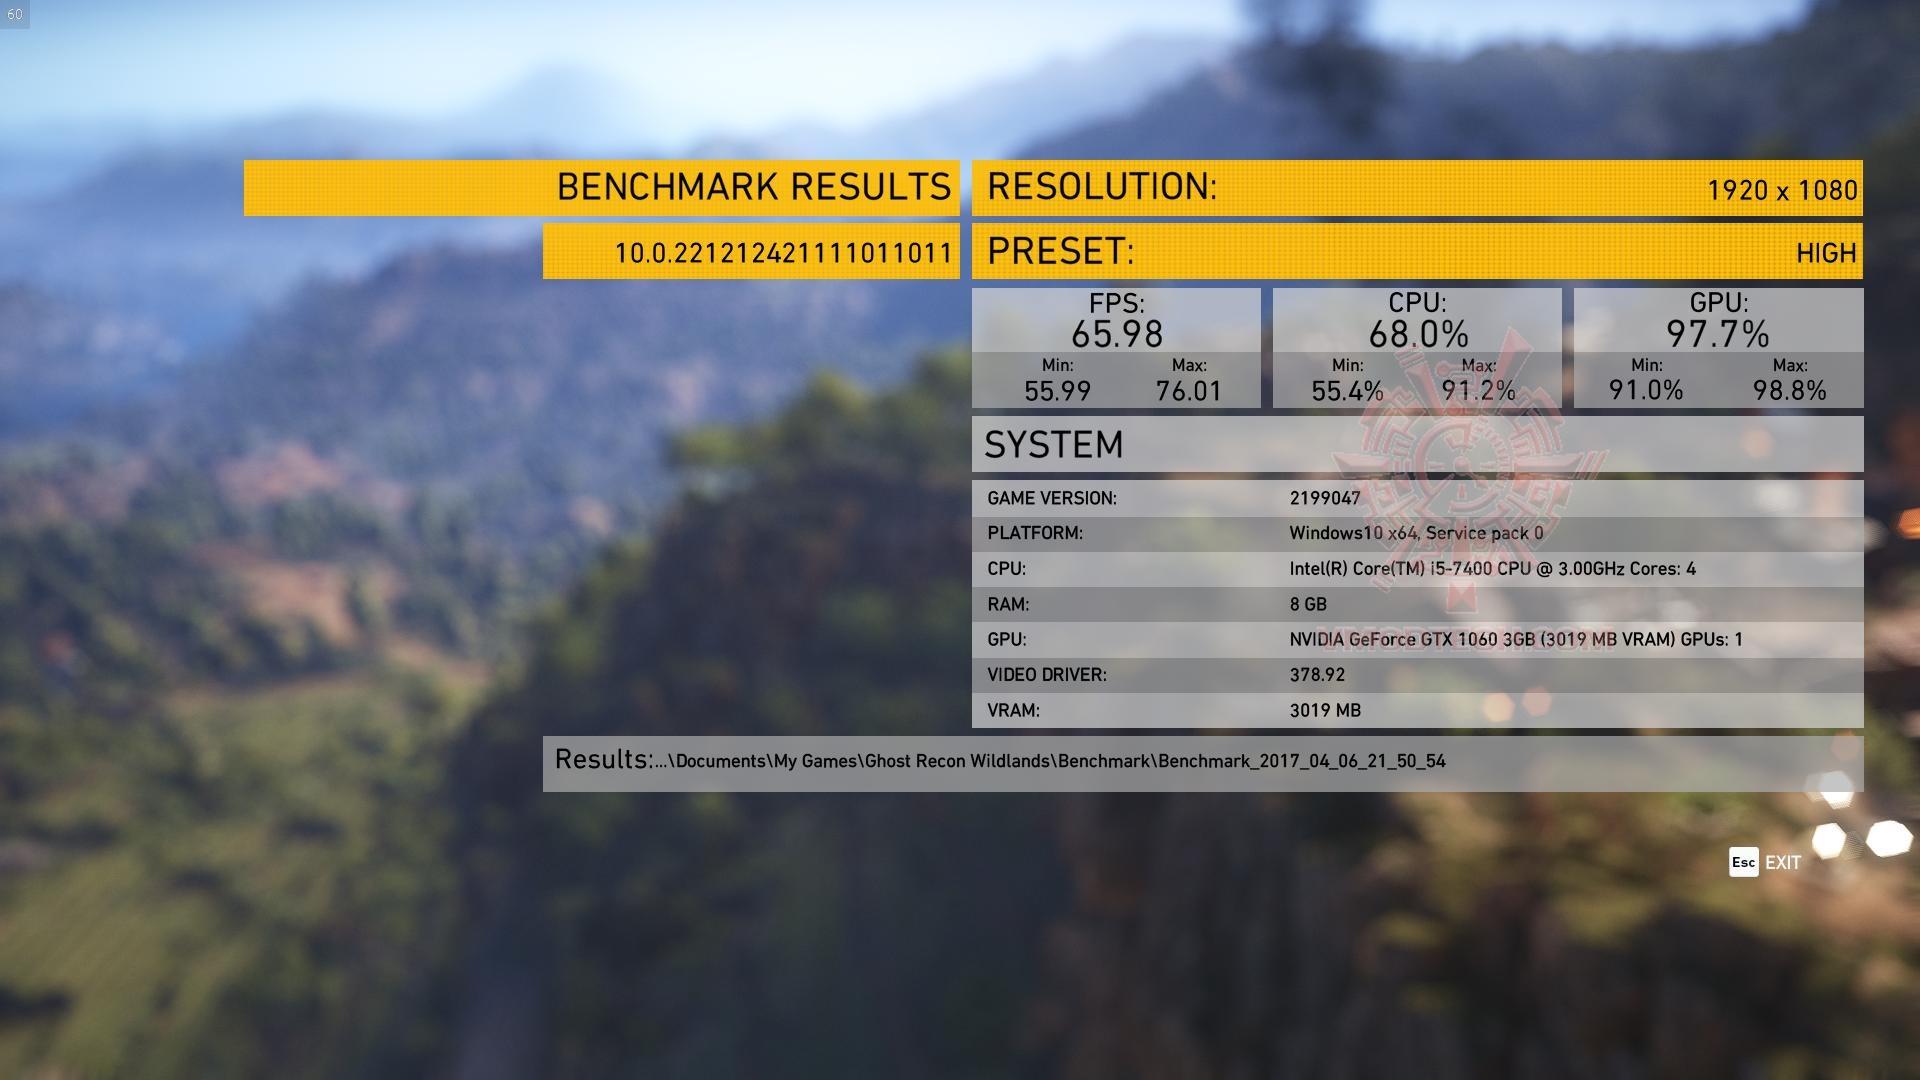 grw 2017 04 06 21 51 39 20 ASUS ROG GR8 II Mini PC Review